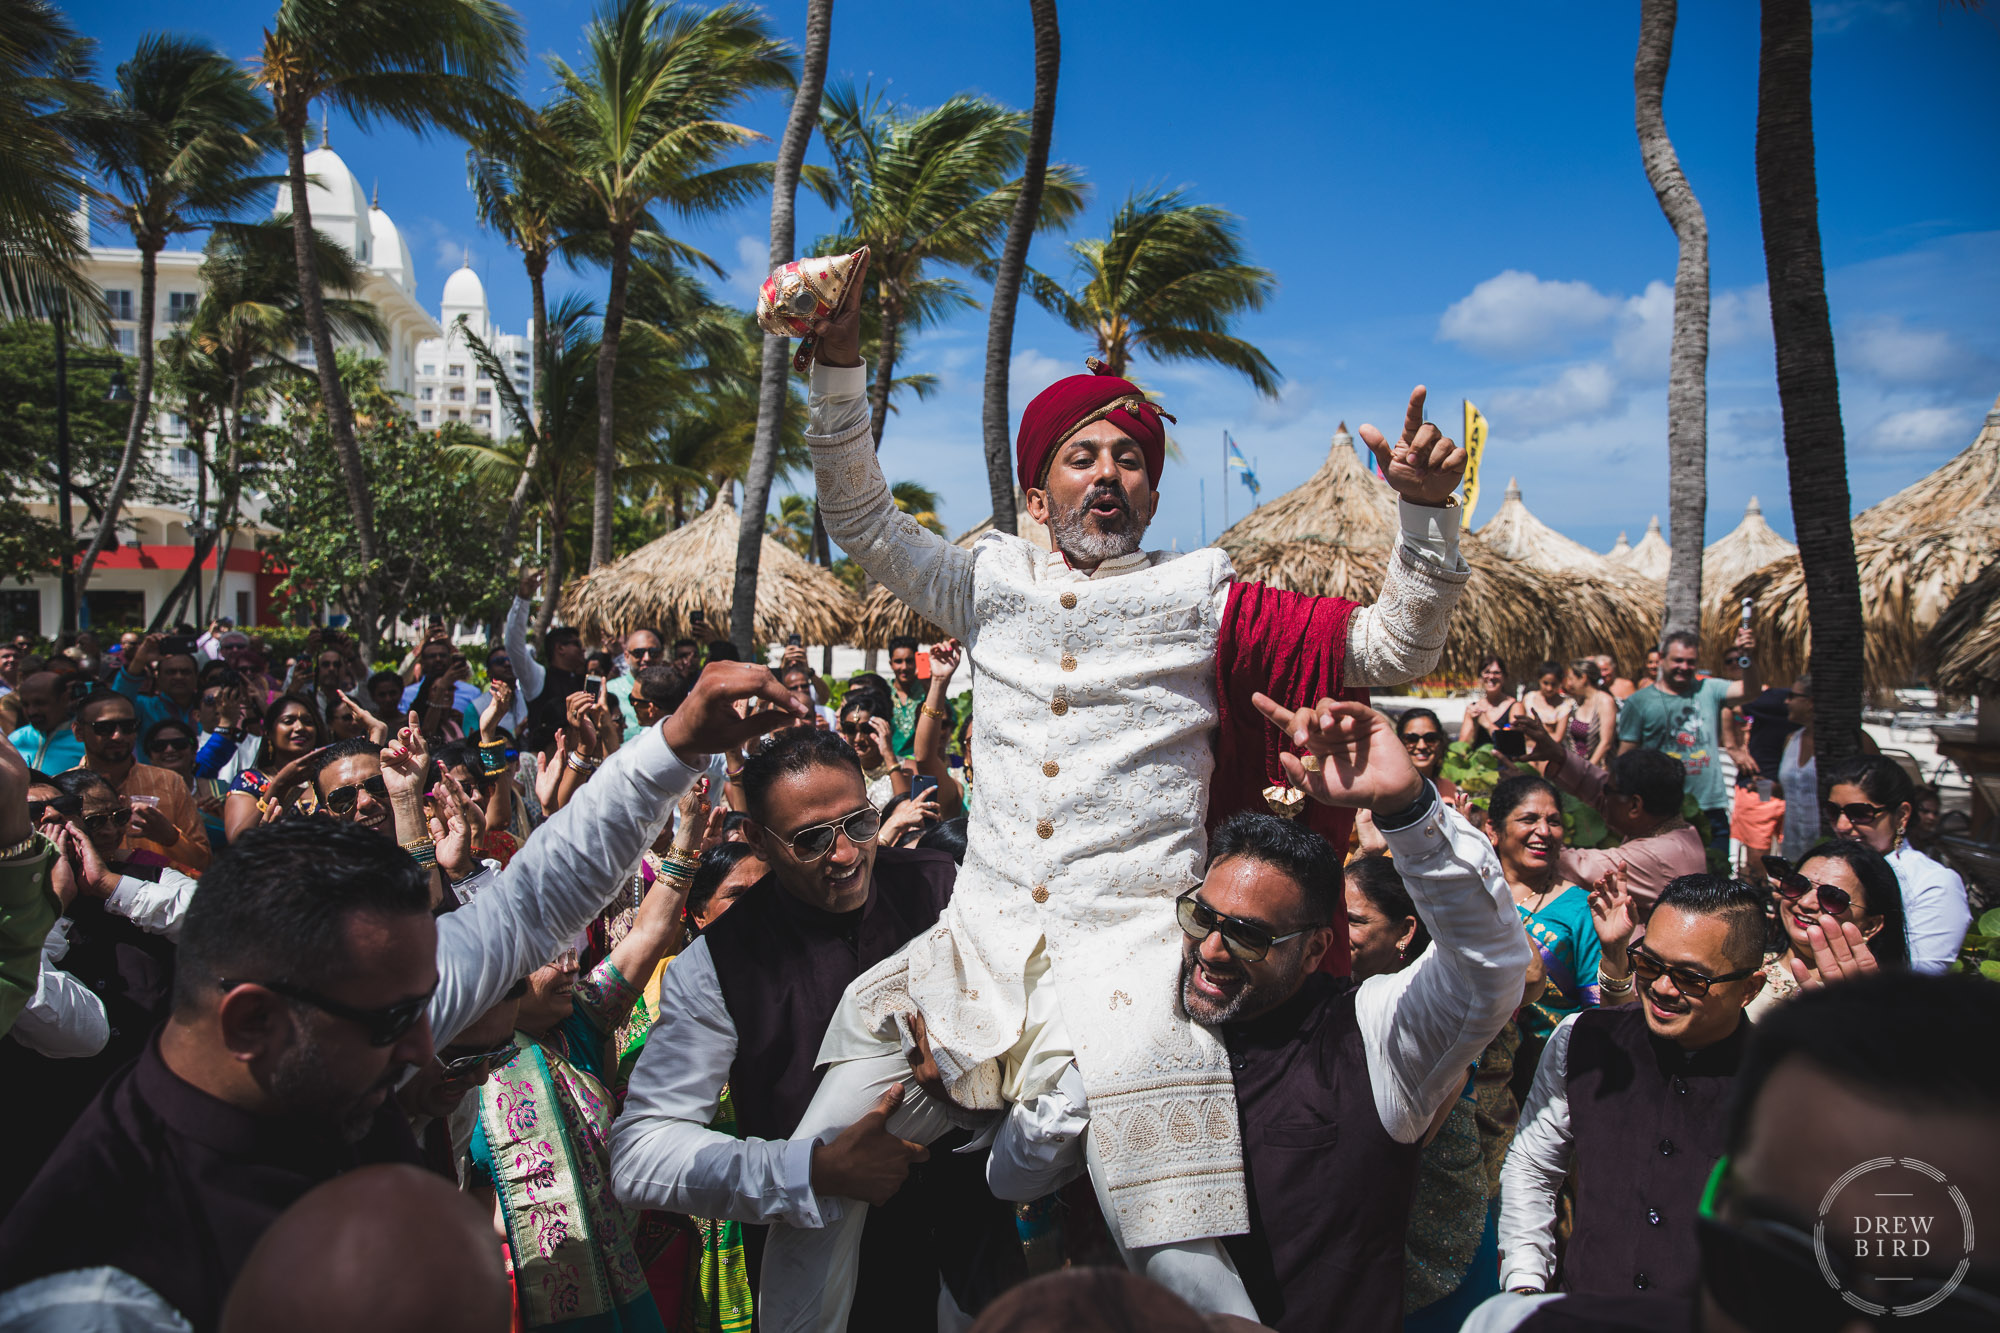 Groom carried by his friends during the Baraat. Indian Hindu wedding. Hilton Aruba destination wedding photographer. San Francisco wedding photojournalist Drew Bird.